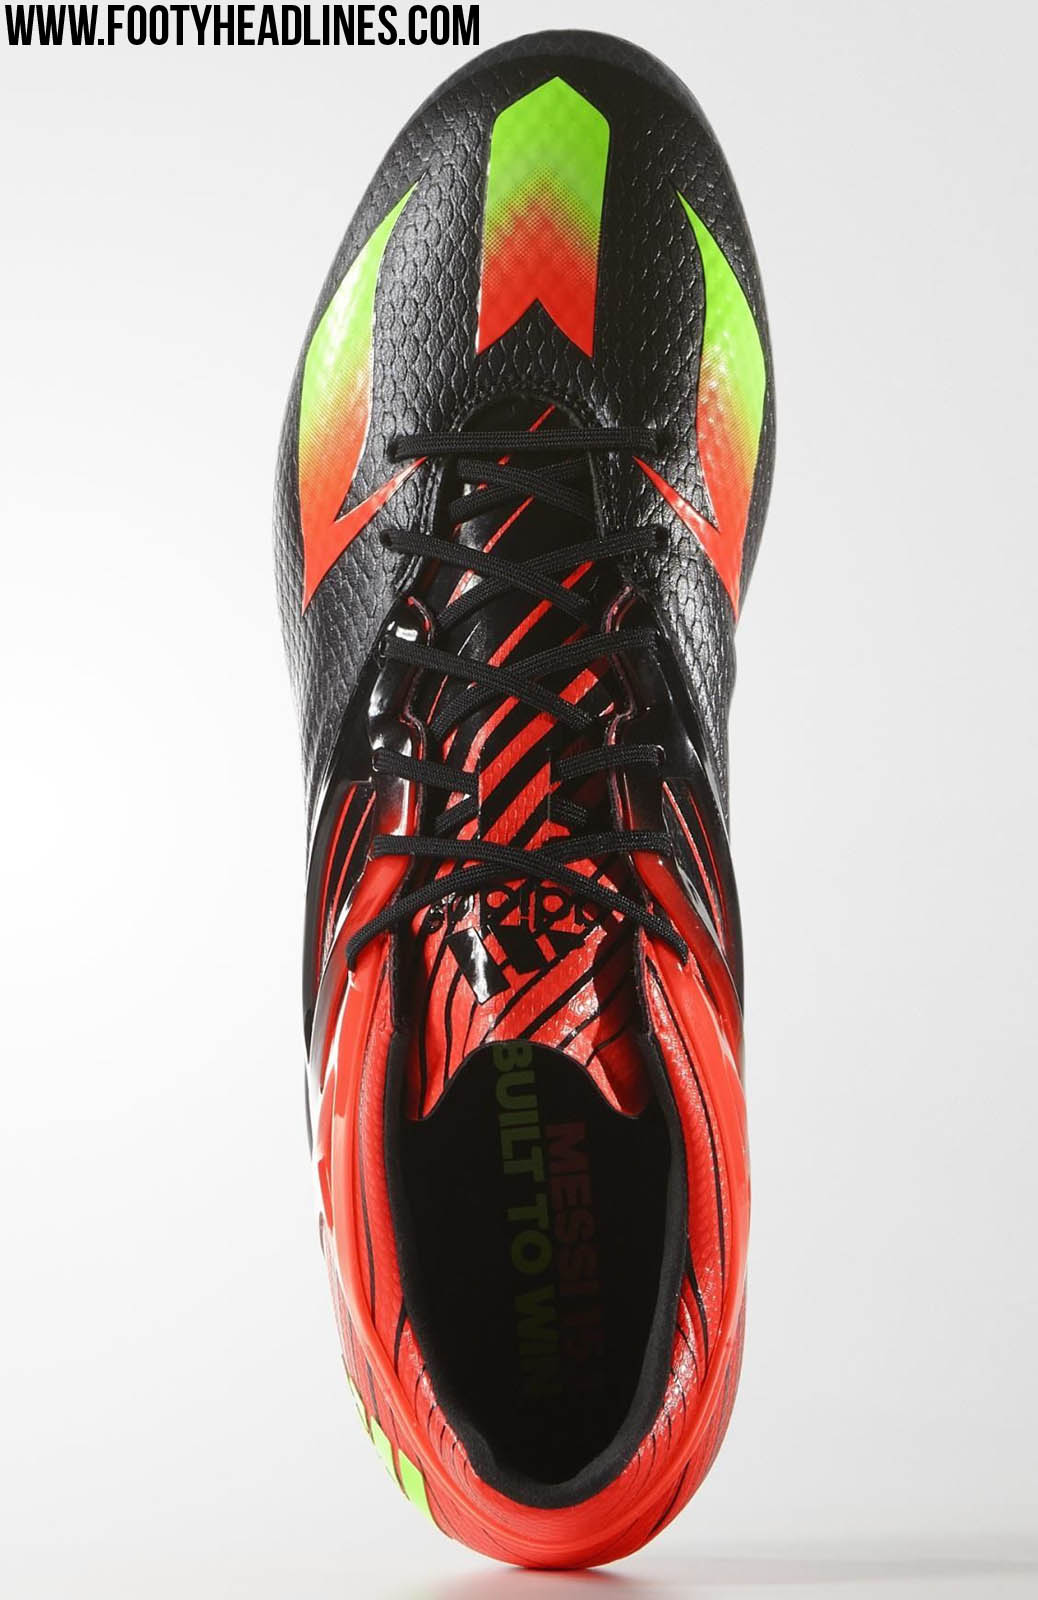 striking adidas messi 2015 2016 boots leaked footy headlines